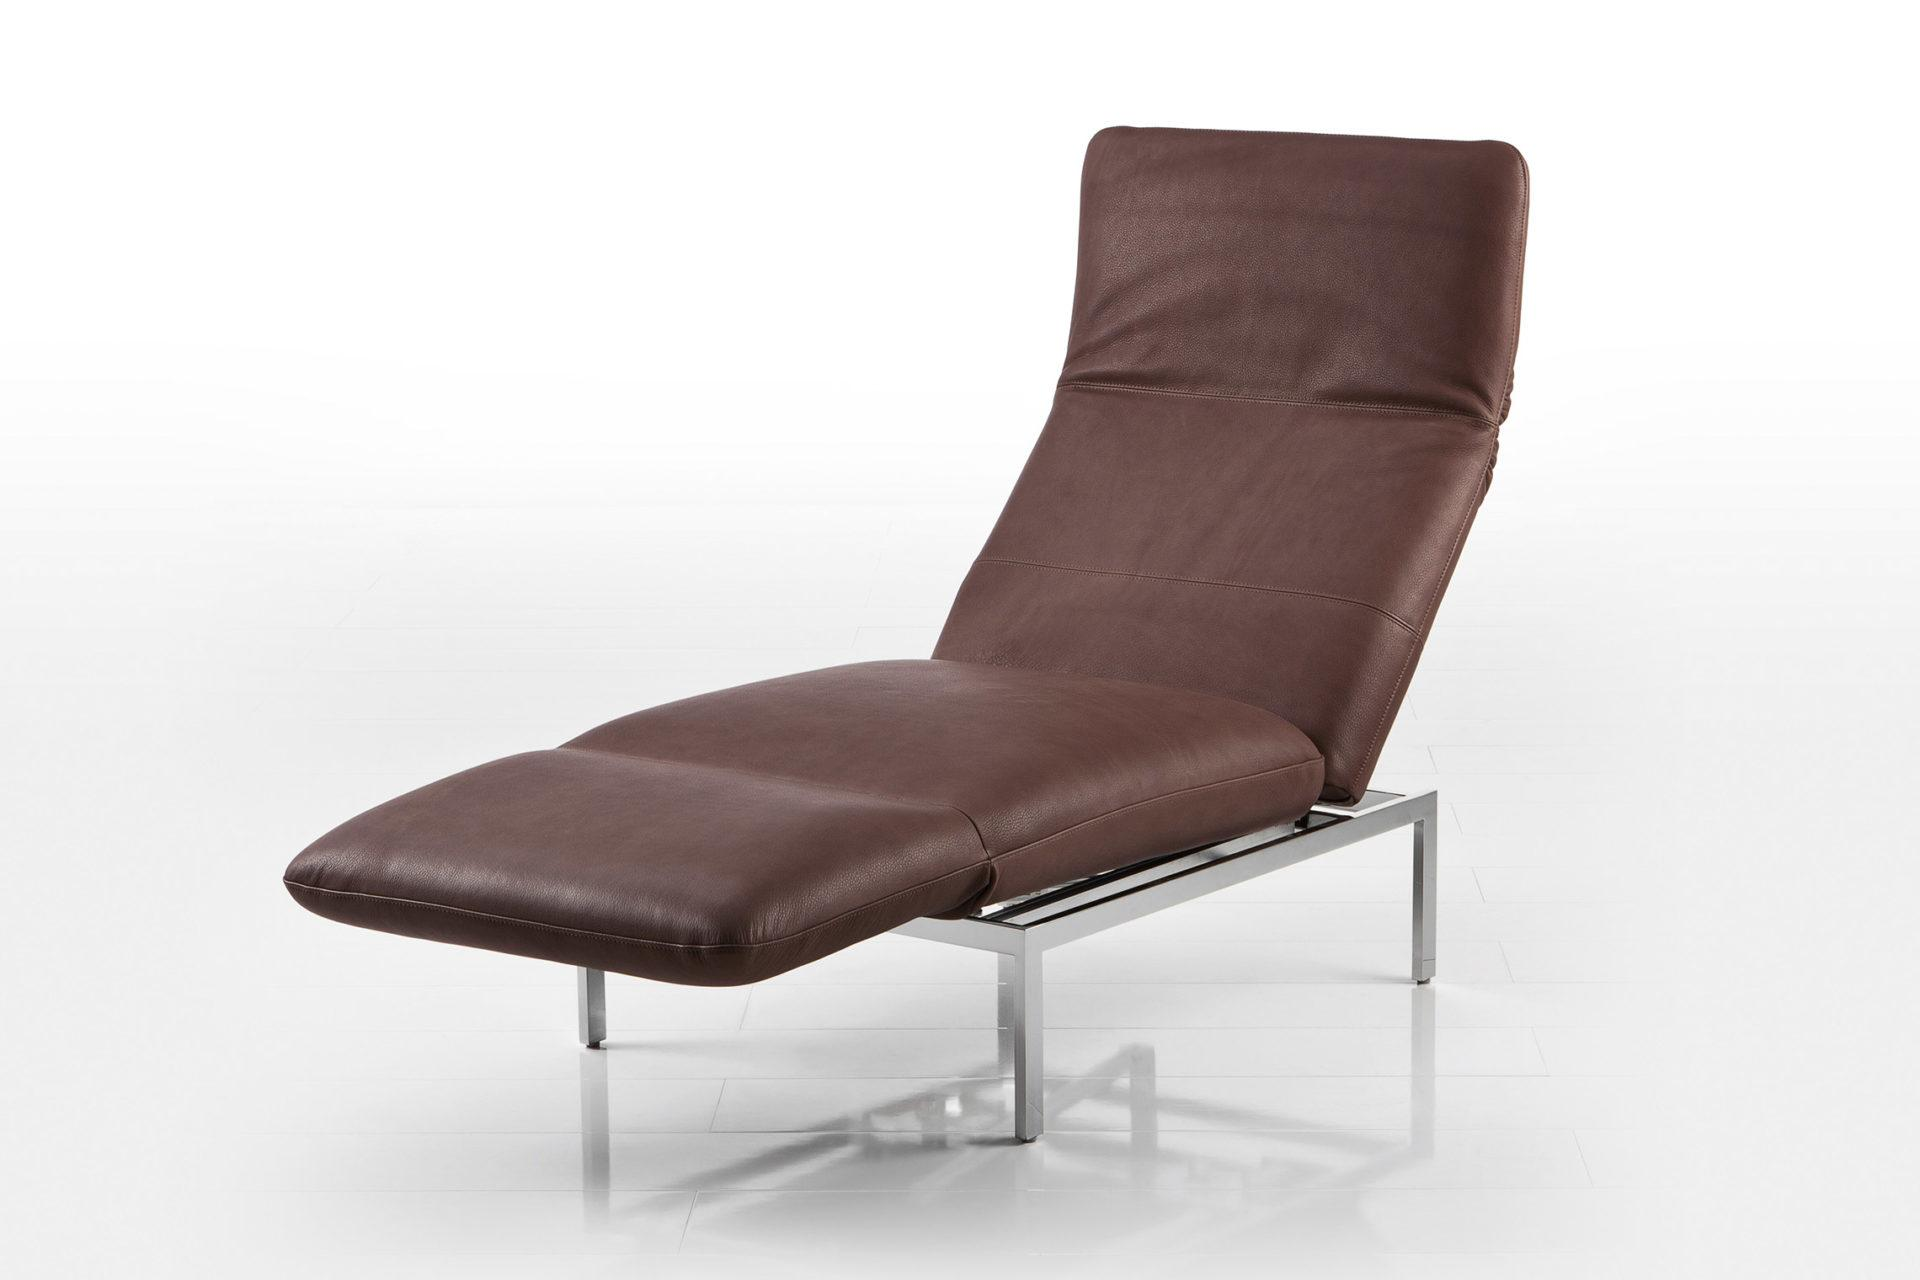 brühl Einsitzer Sessel Relax Fußstütze roro